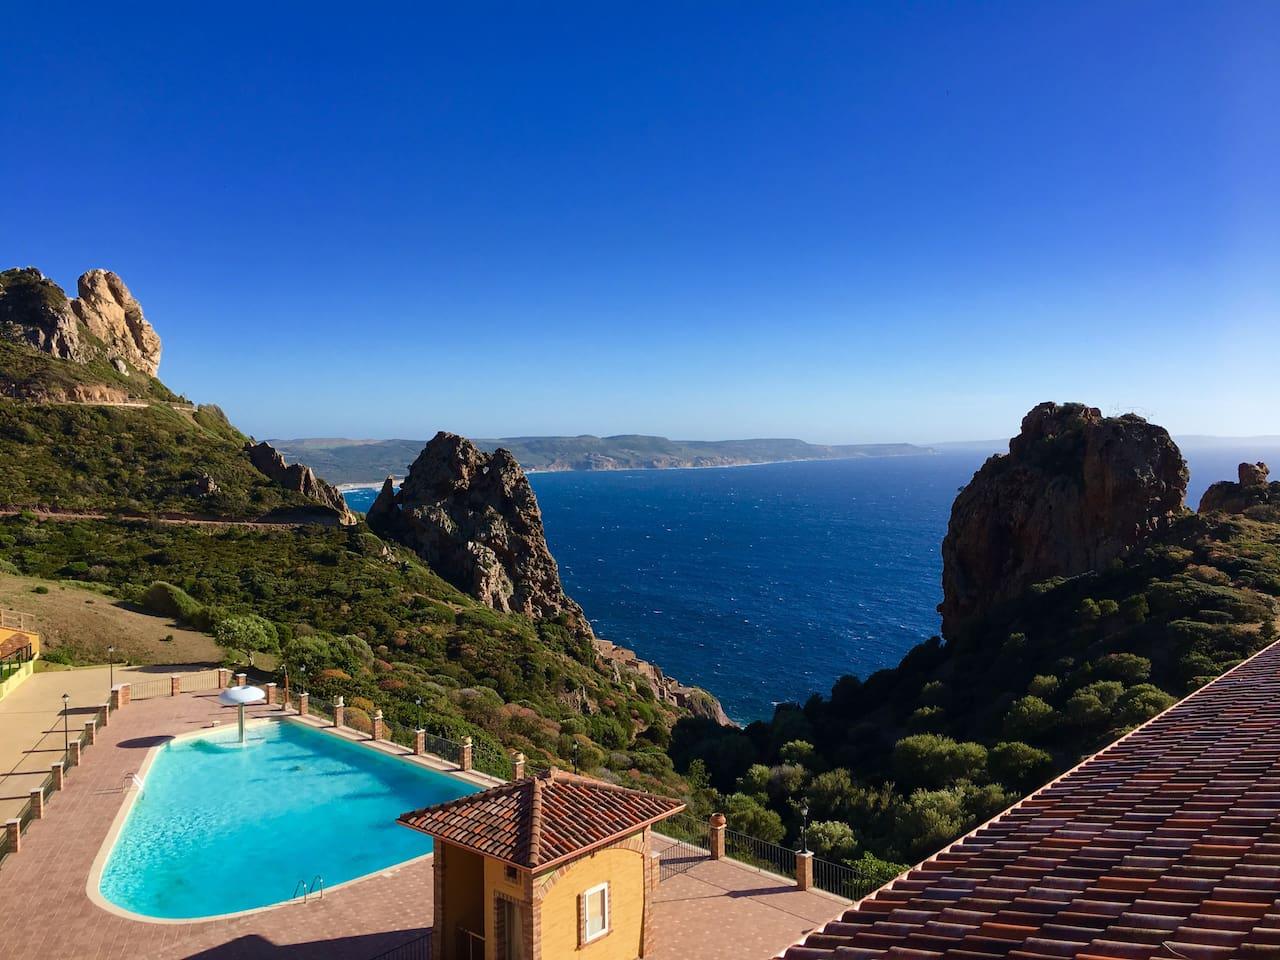 Il Veliero Tanca Piras piscina+vista mare+6 posti - Häuser zur Miete ...